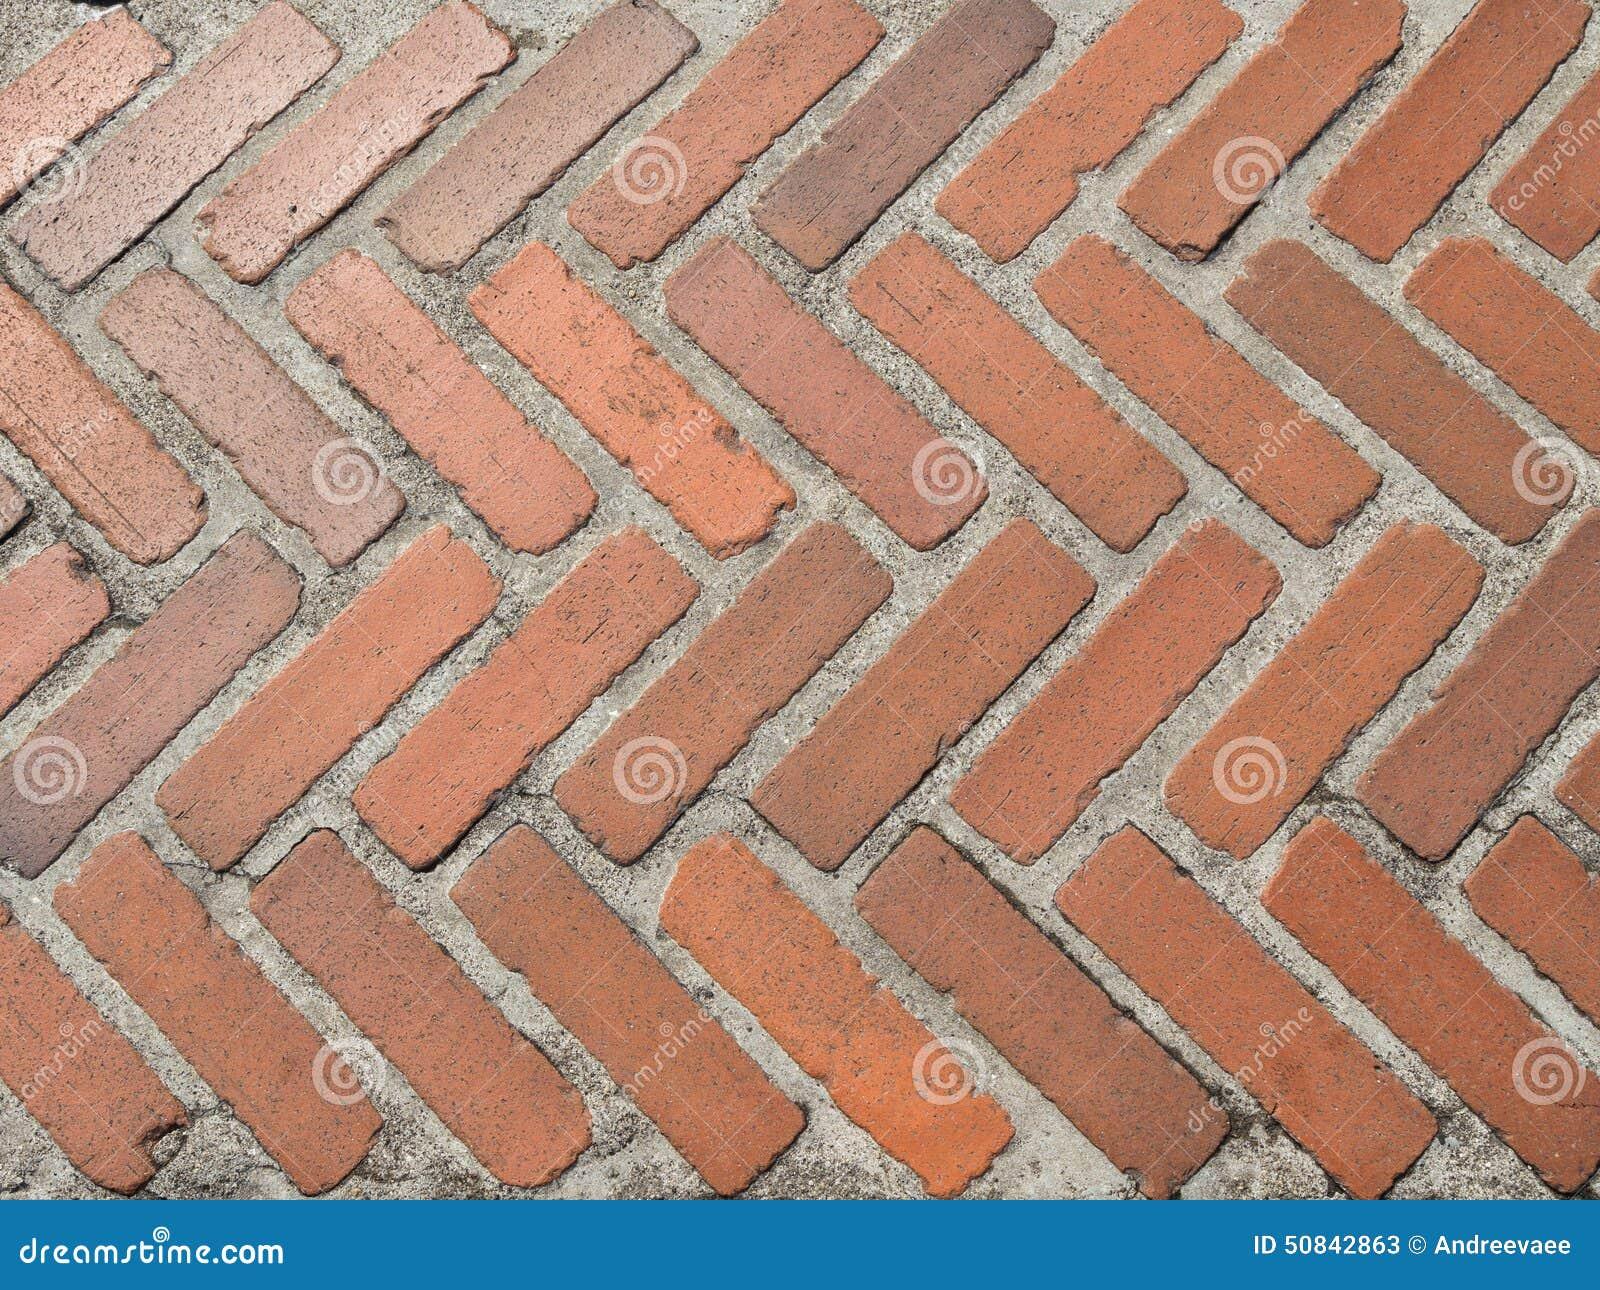 Brick path stock image. Image of rural, construction - 50842863